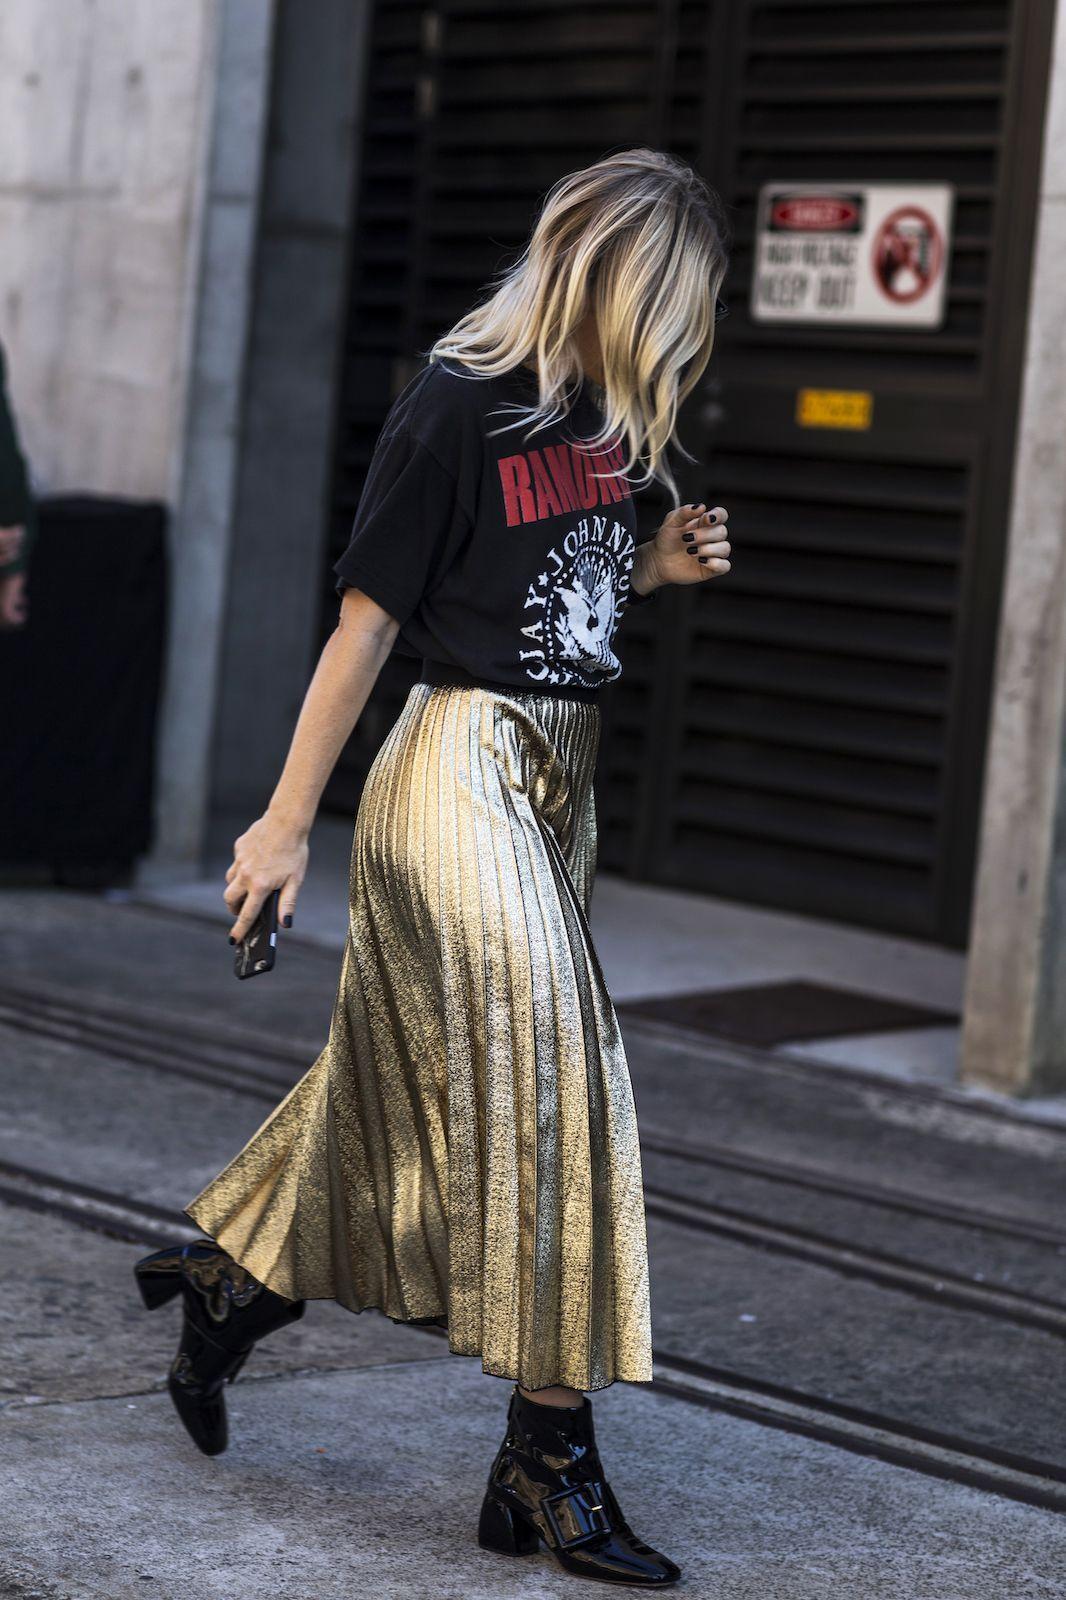 Metallic Pleated Skirt with Tee